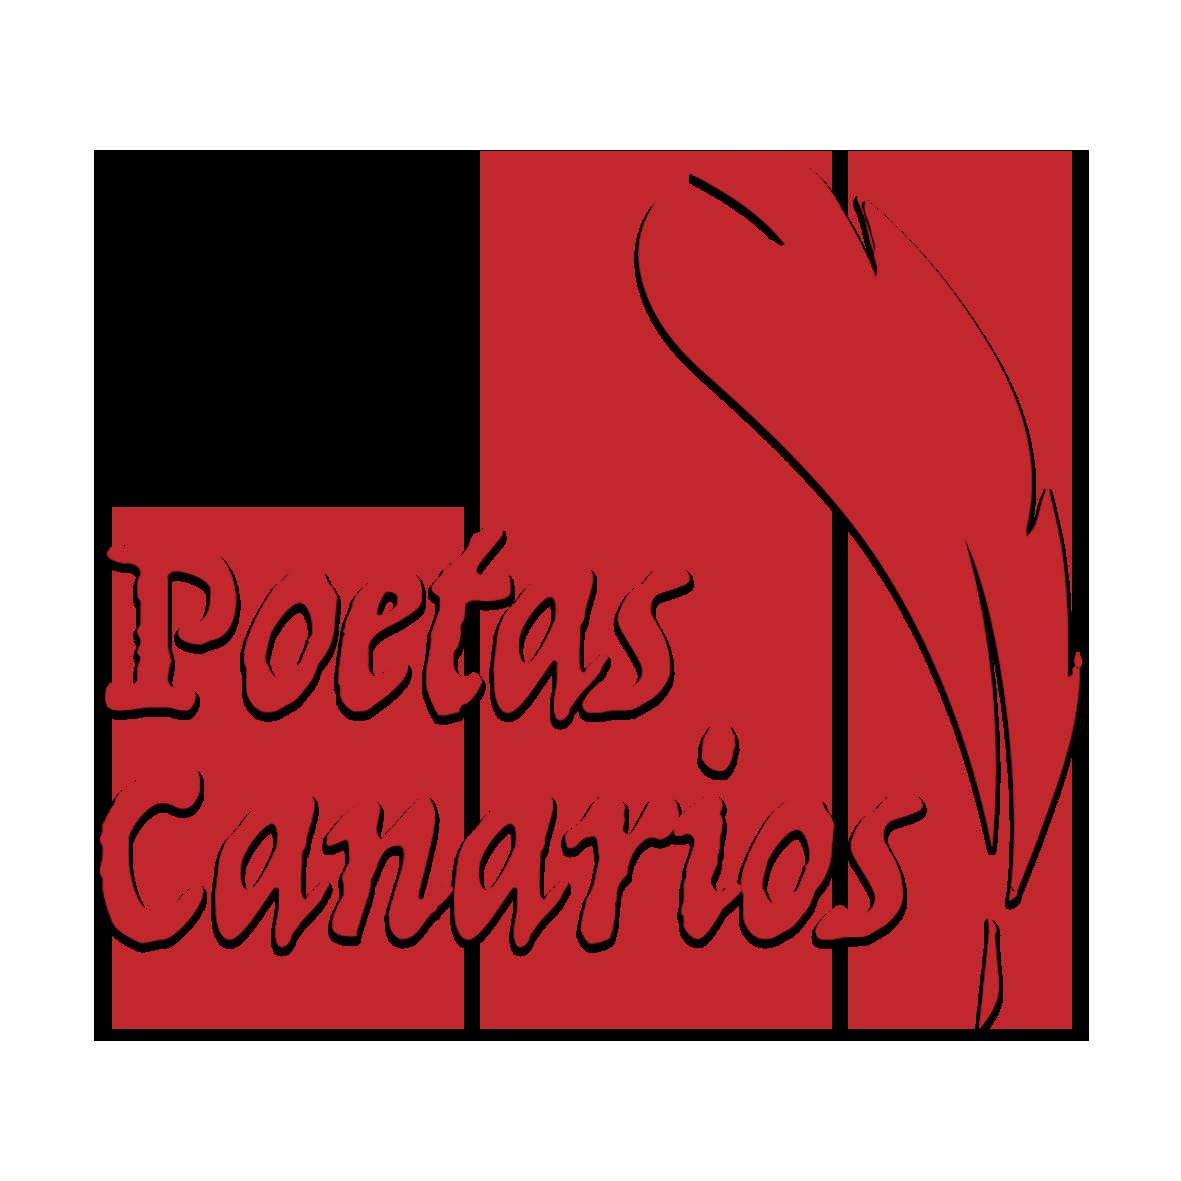 PoetasCanarios